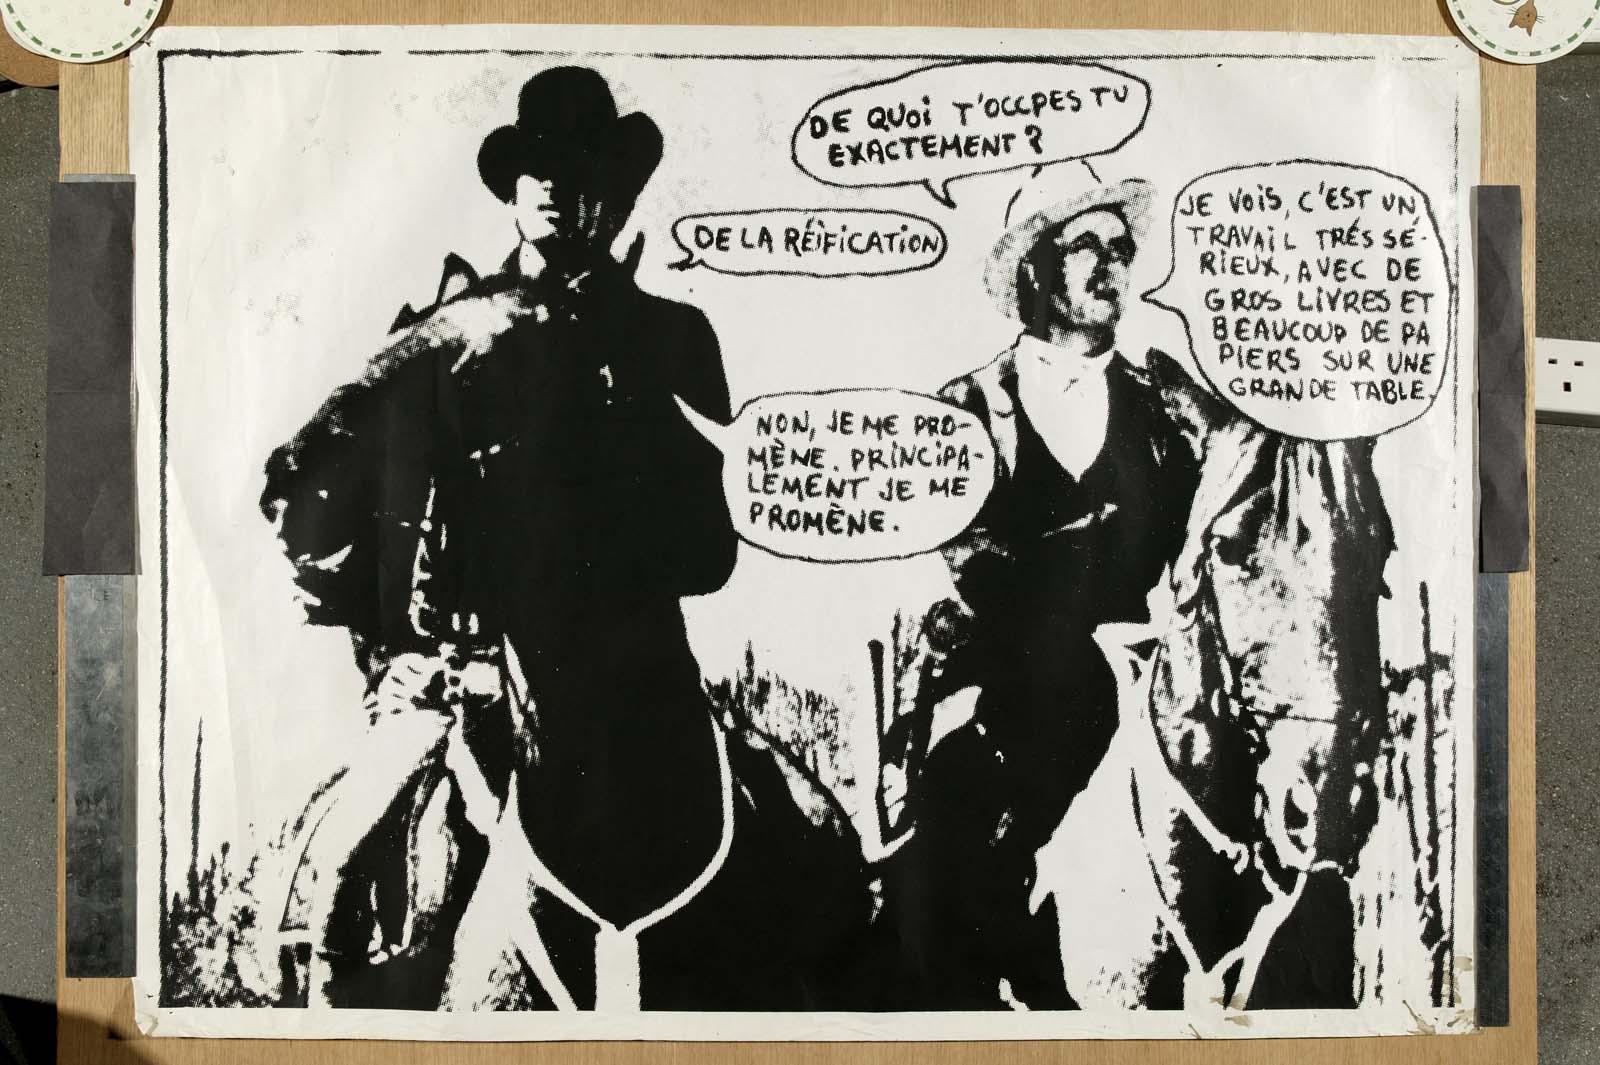 a poster featuring two retro cartoon cowboys promoting a Durutti Column concert